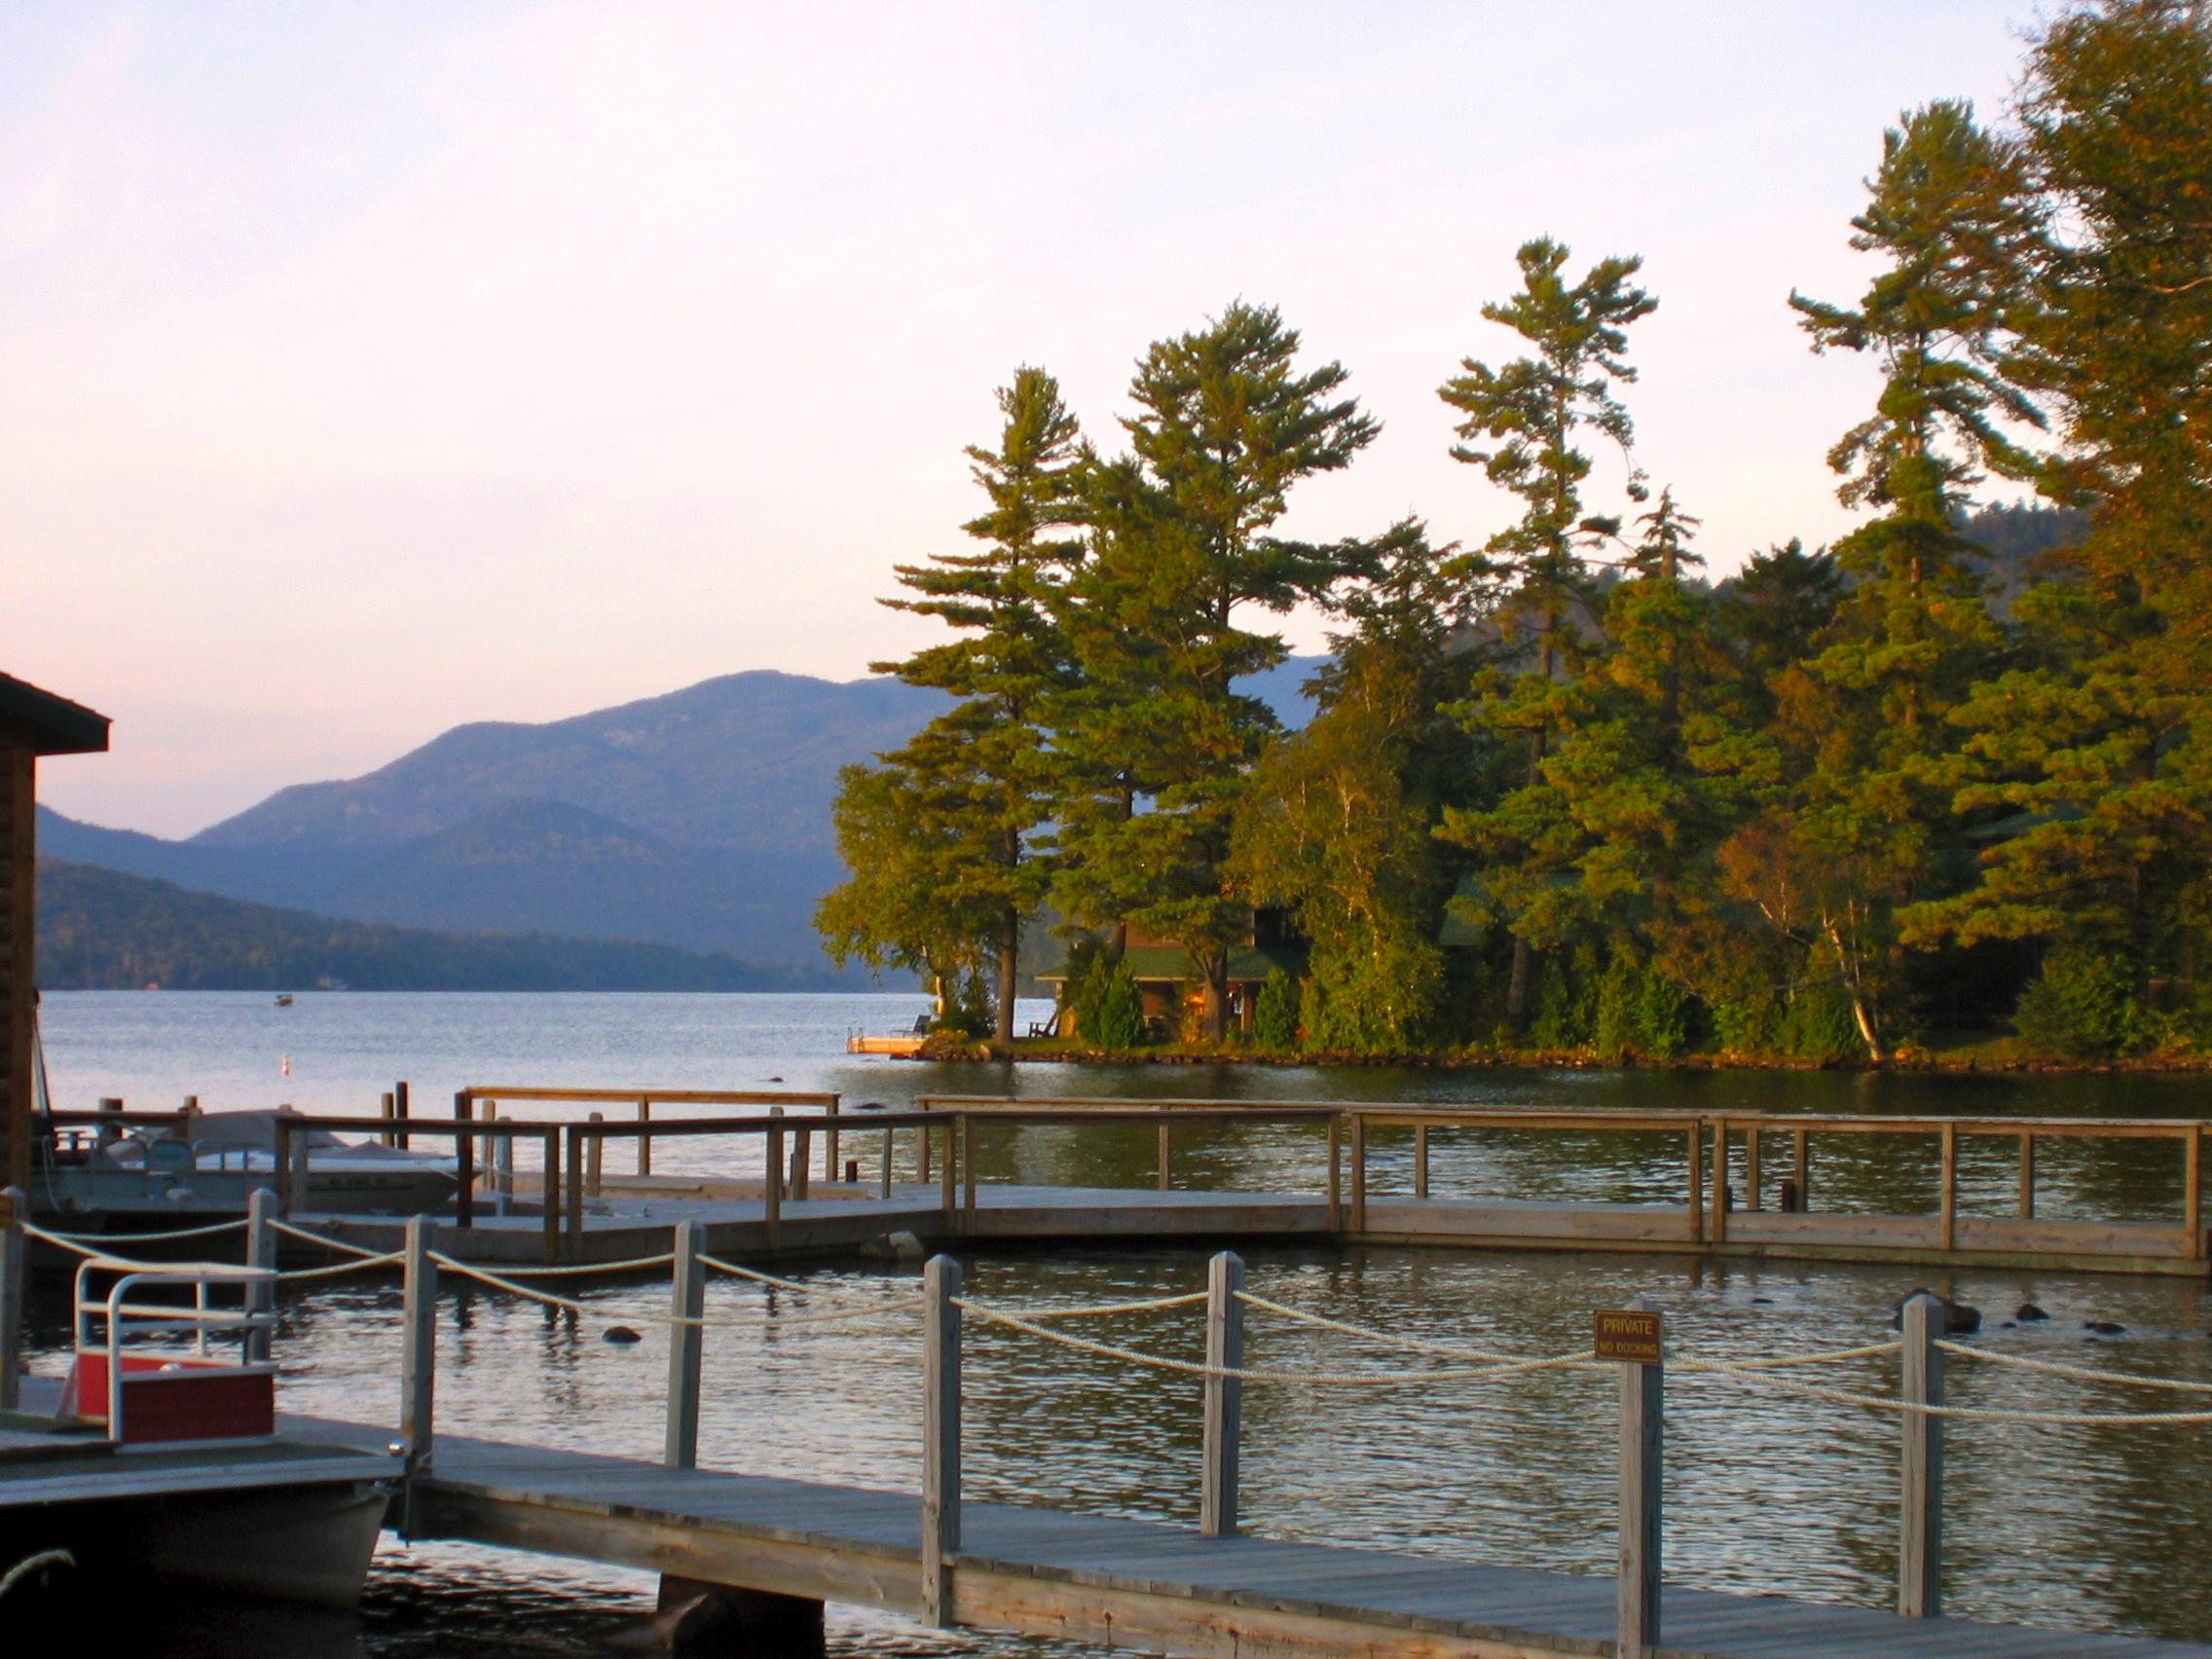 Lake Placid Marina